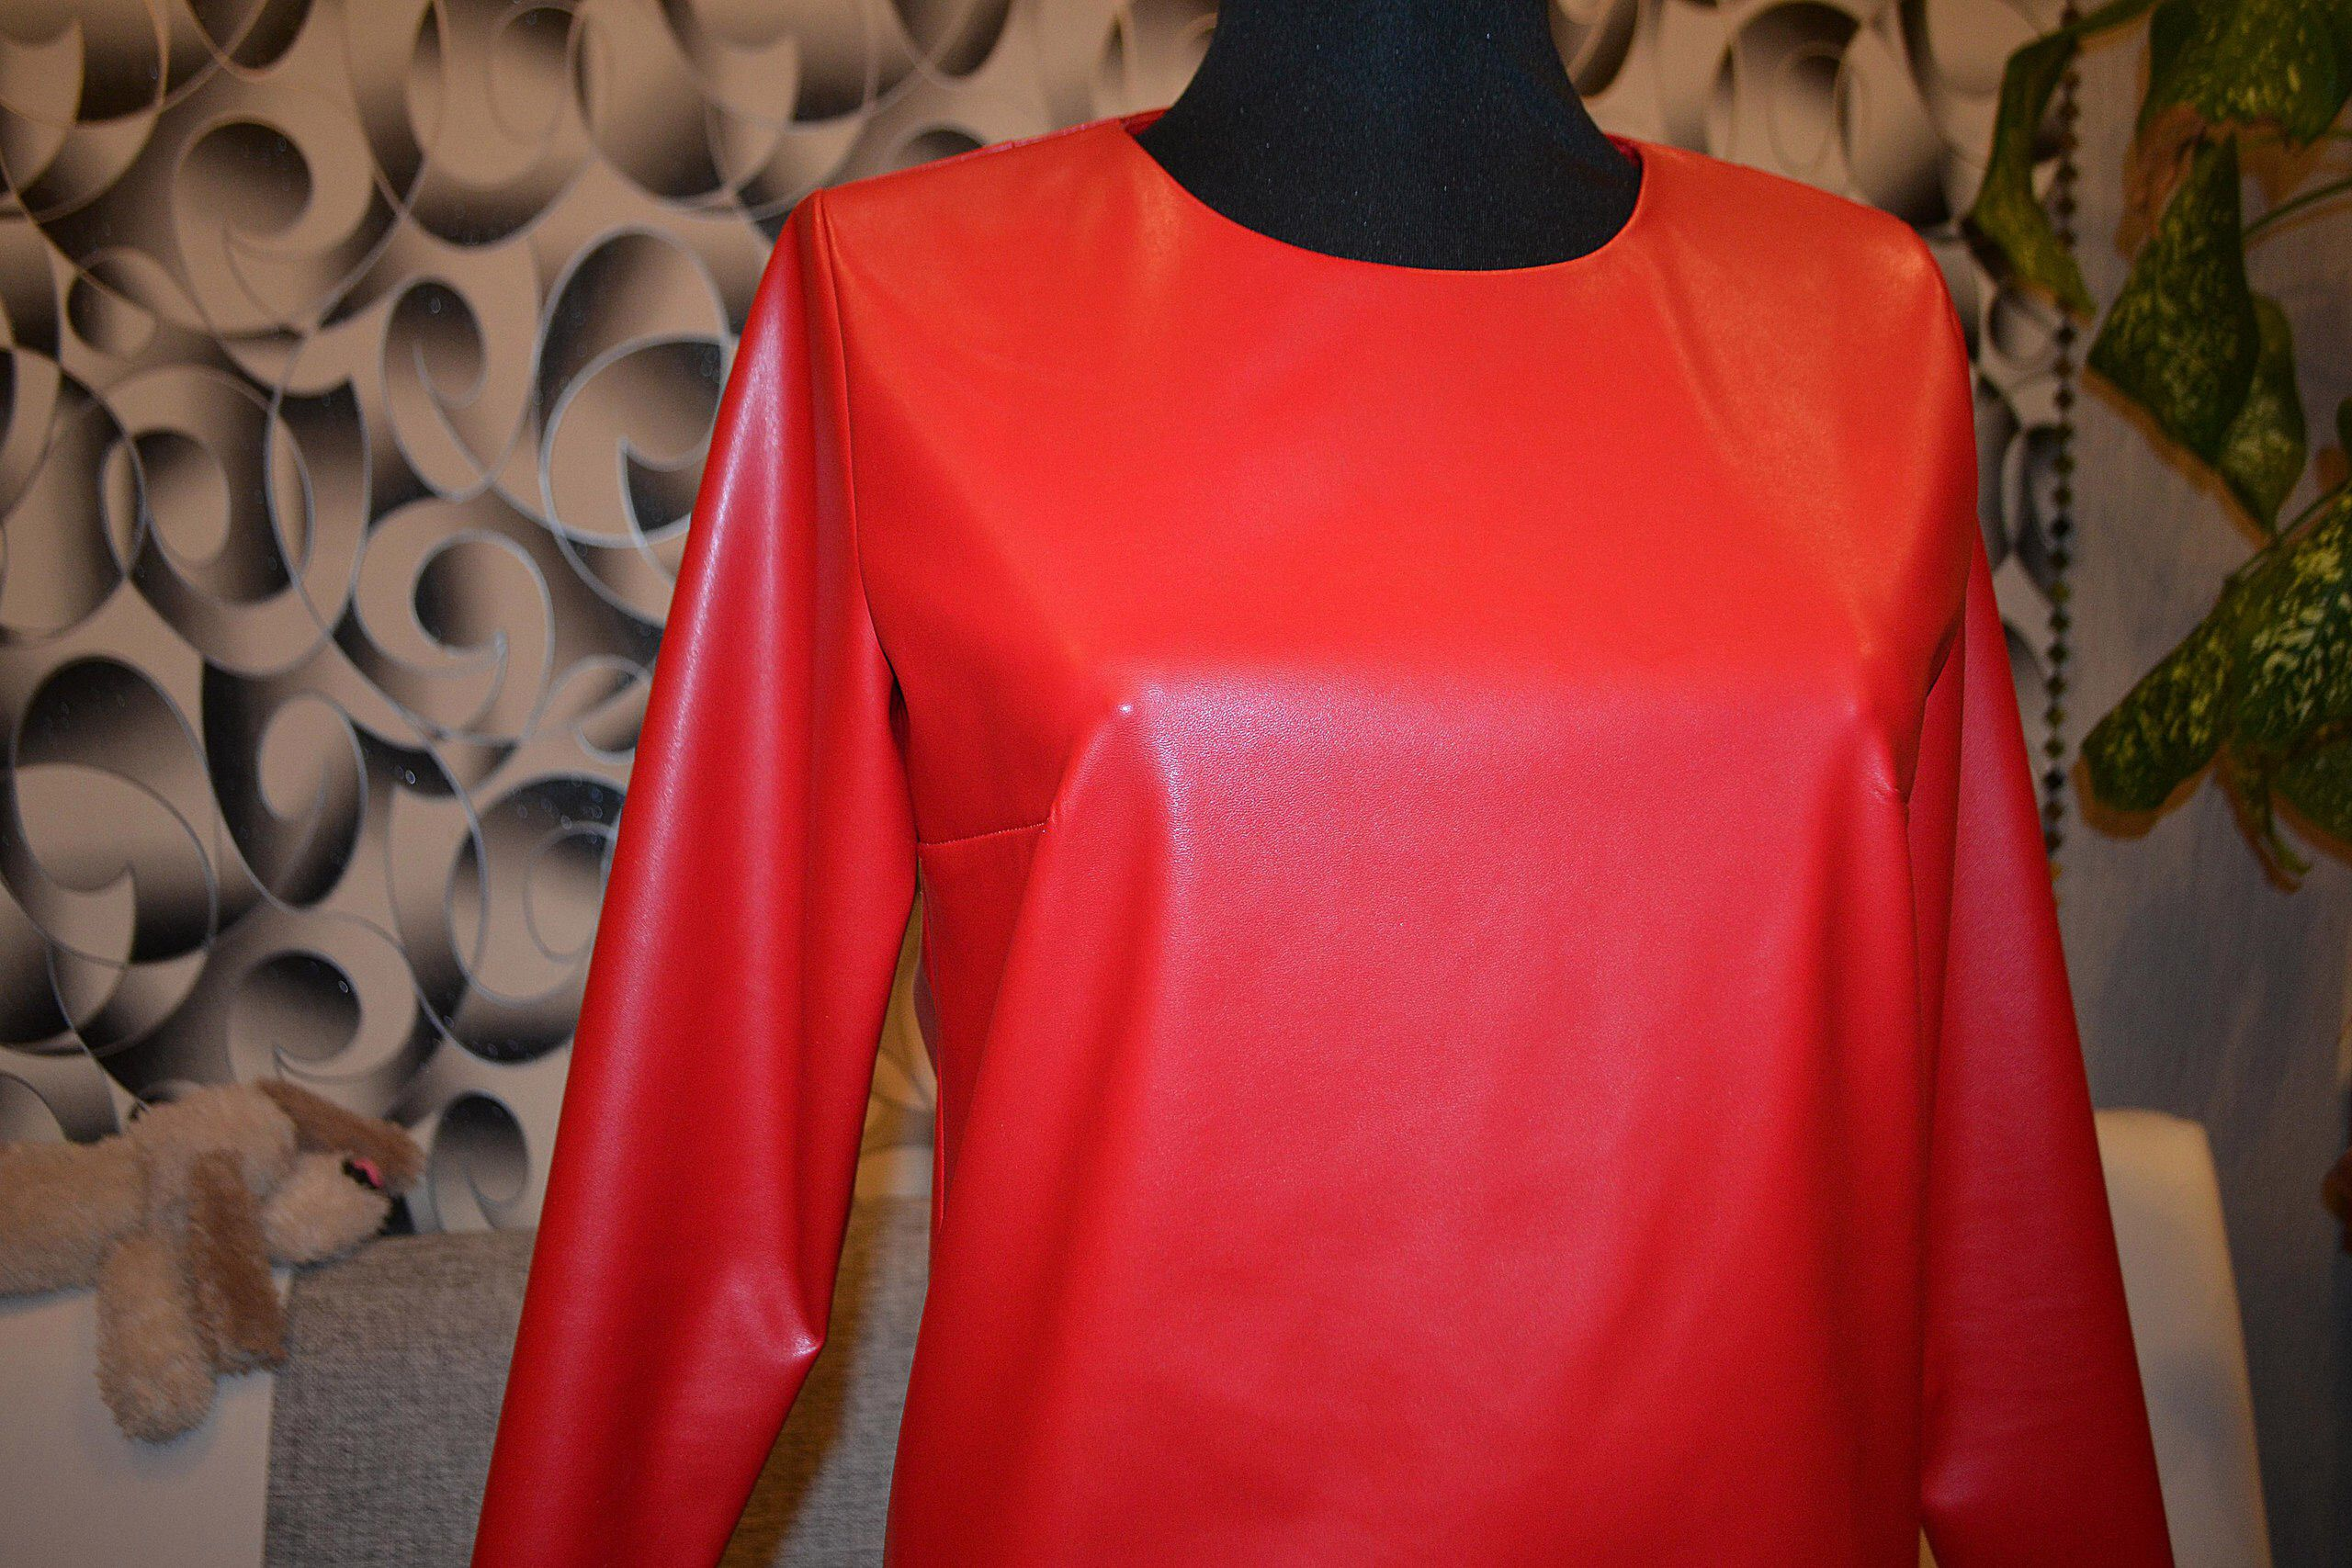 кожаное мини короткое платьемини кожаноеплатье платье красноеплатье